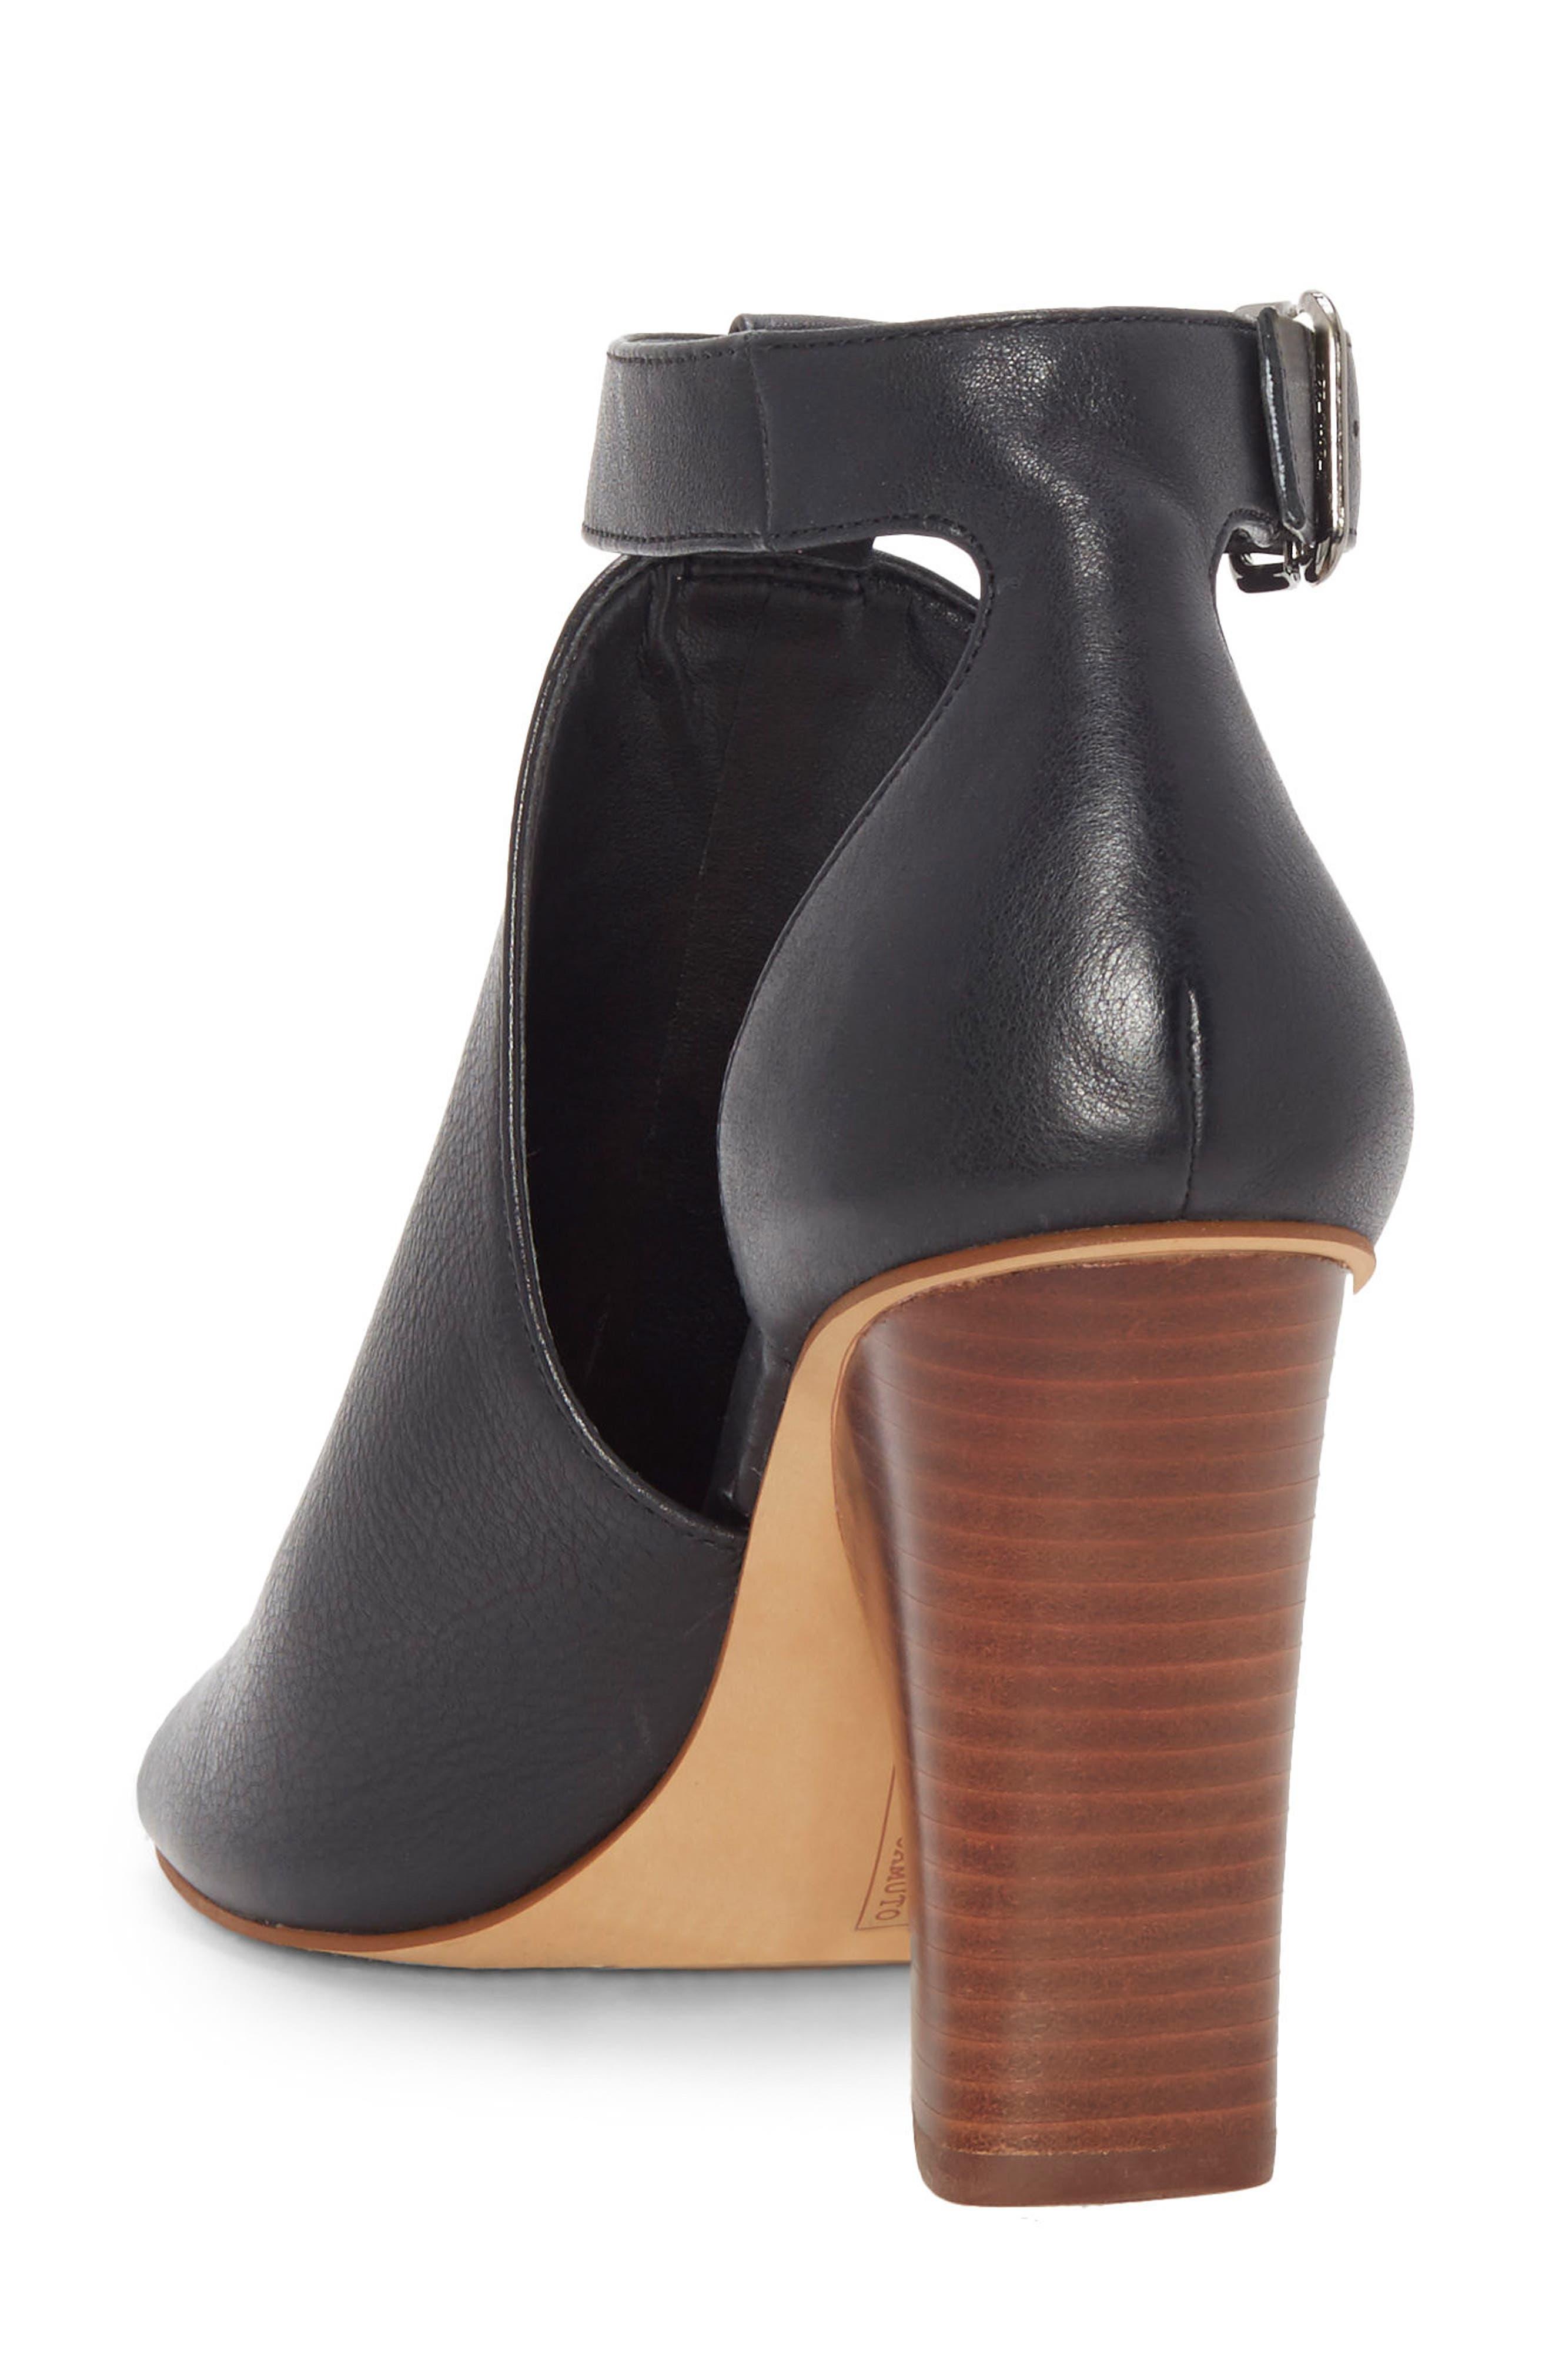 Adaren Peep Toe Sandal,                             Alternate thumbnail 2, color,                             BLACK LEATHER